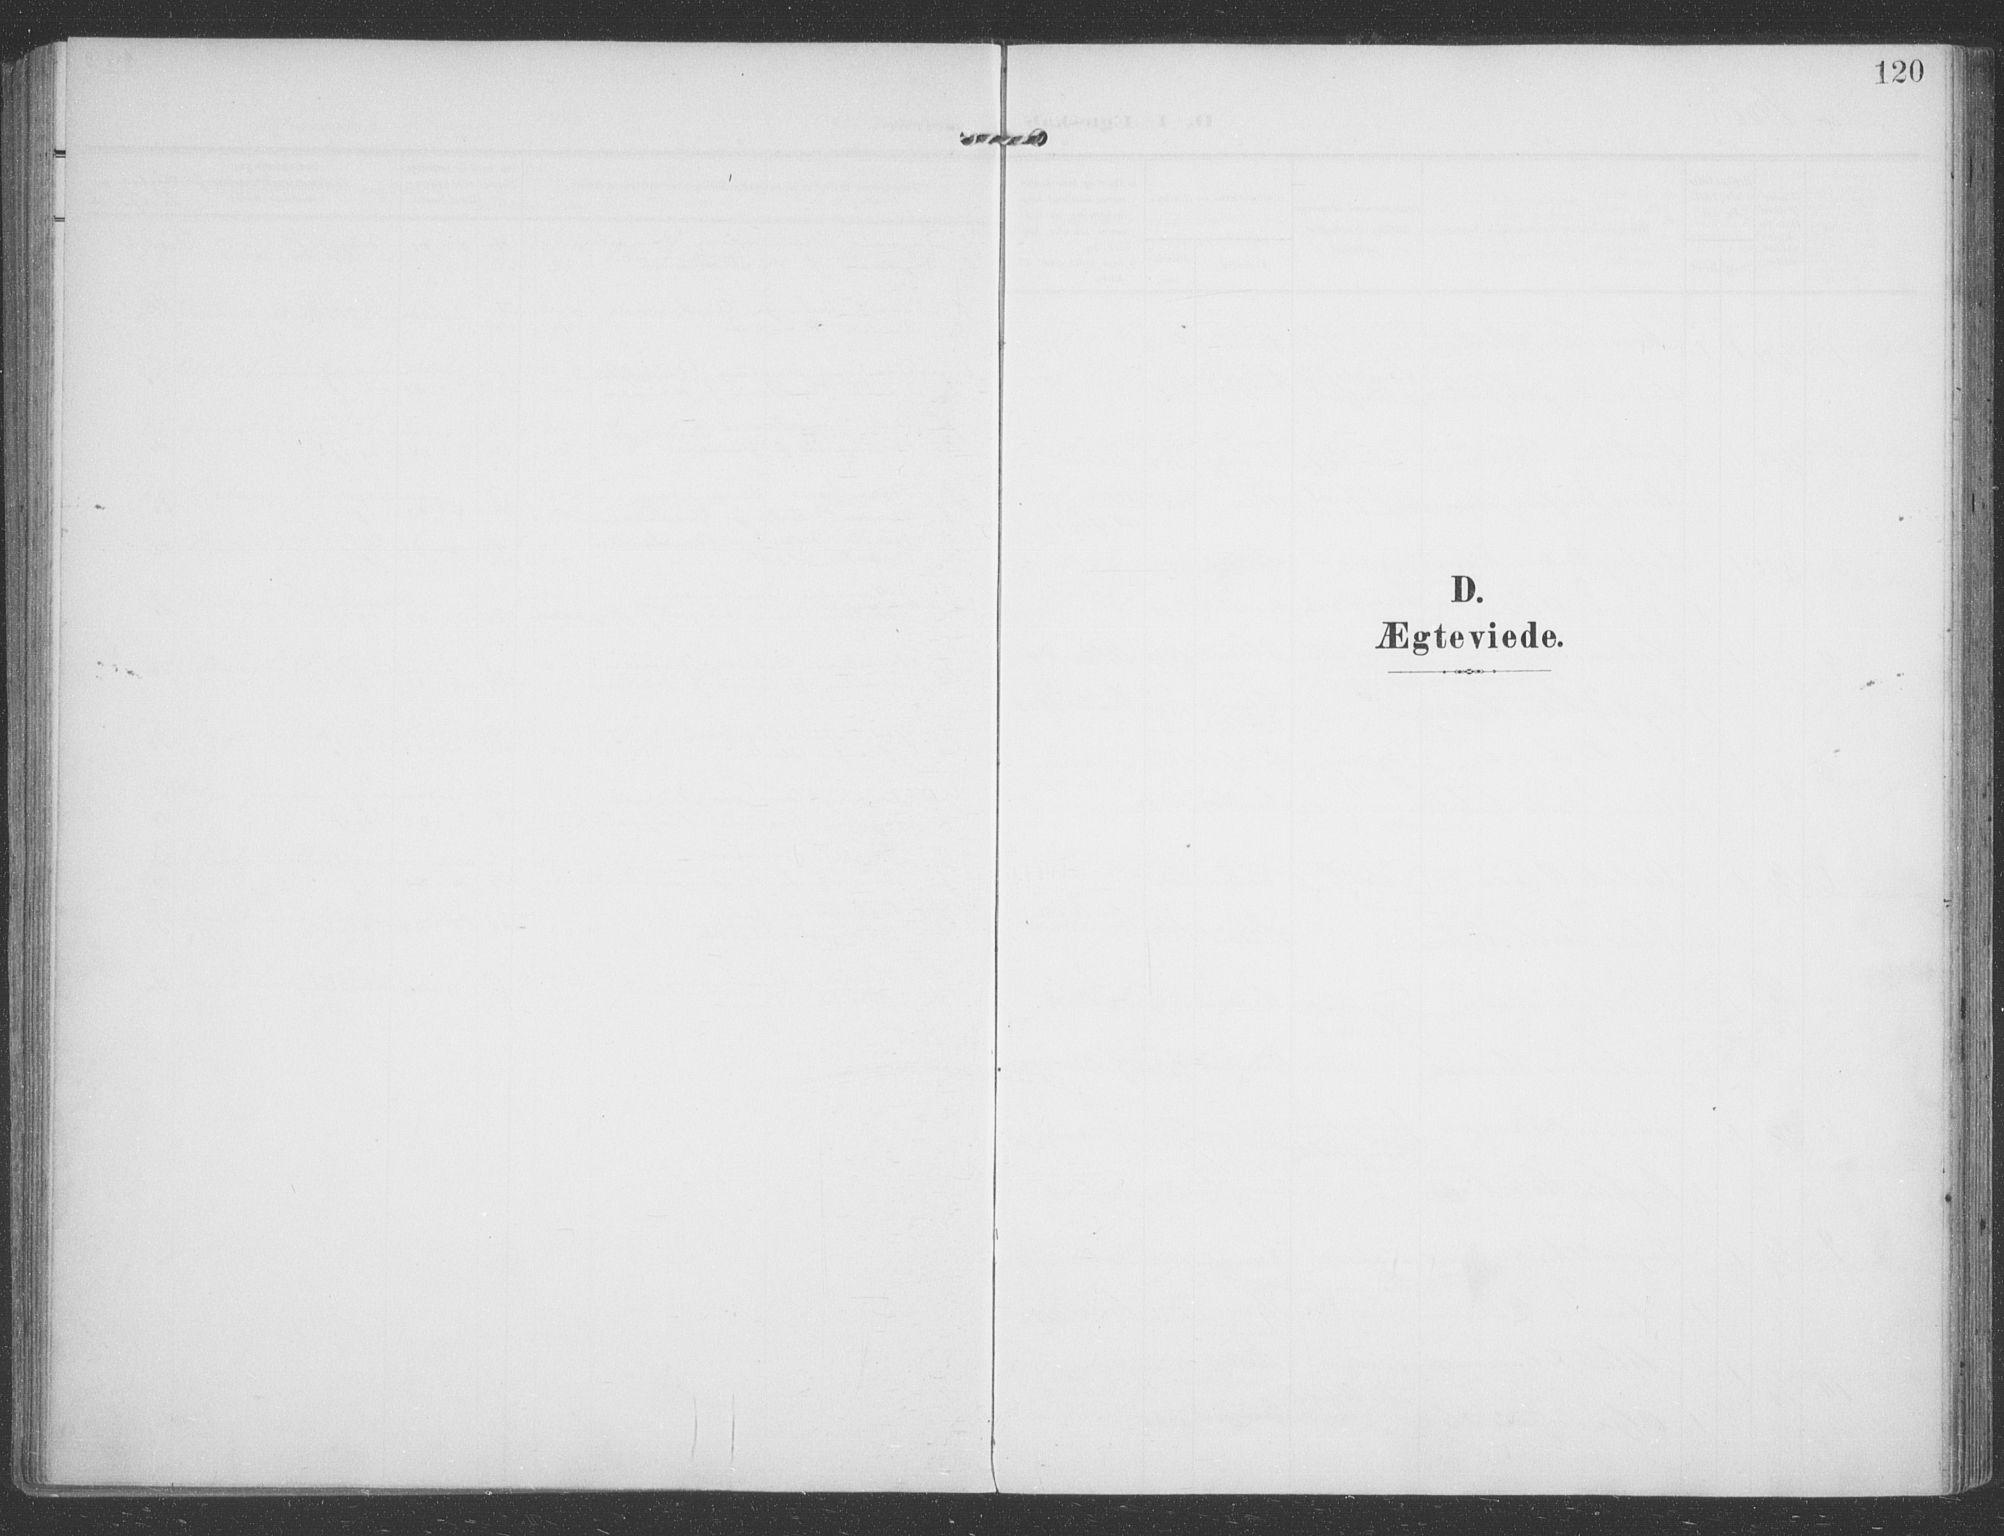 SATØ, Talvik sokneprestkontor, H/Ha/L0017kirke: Ministerialbok nr. 17, 1906-1915, s. 120